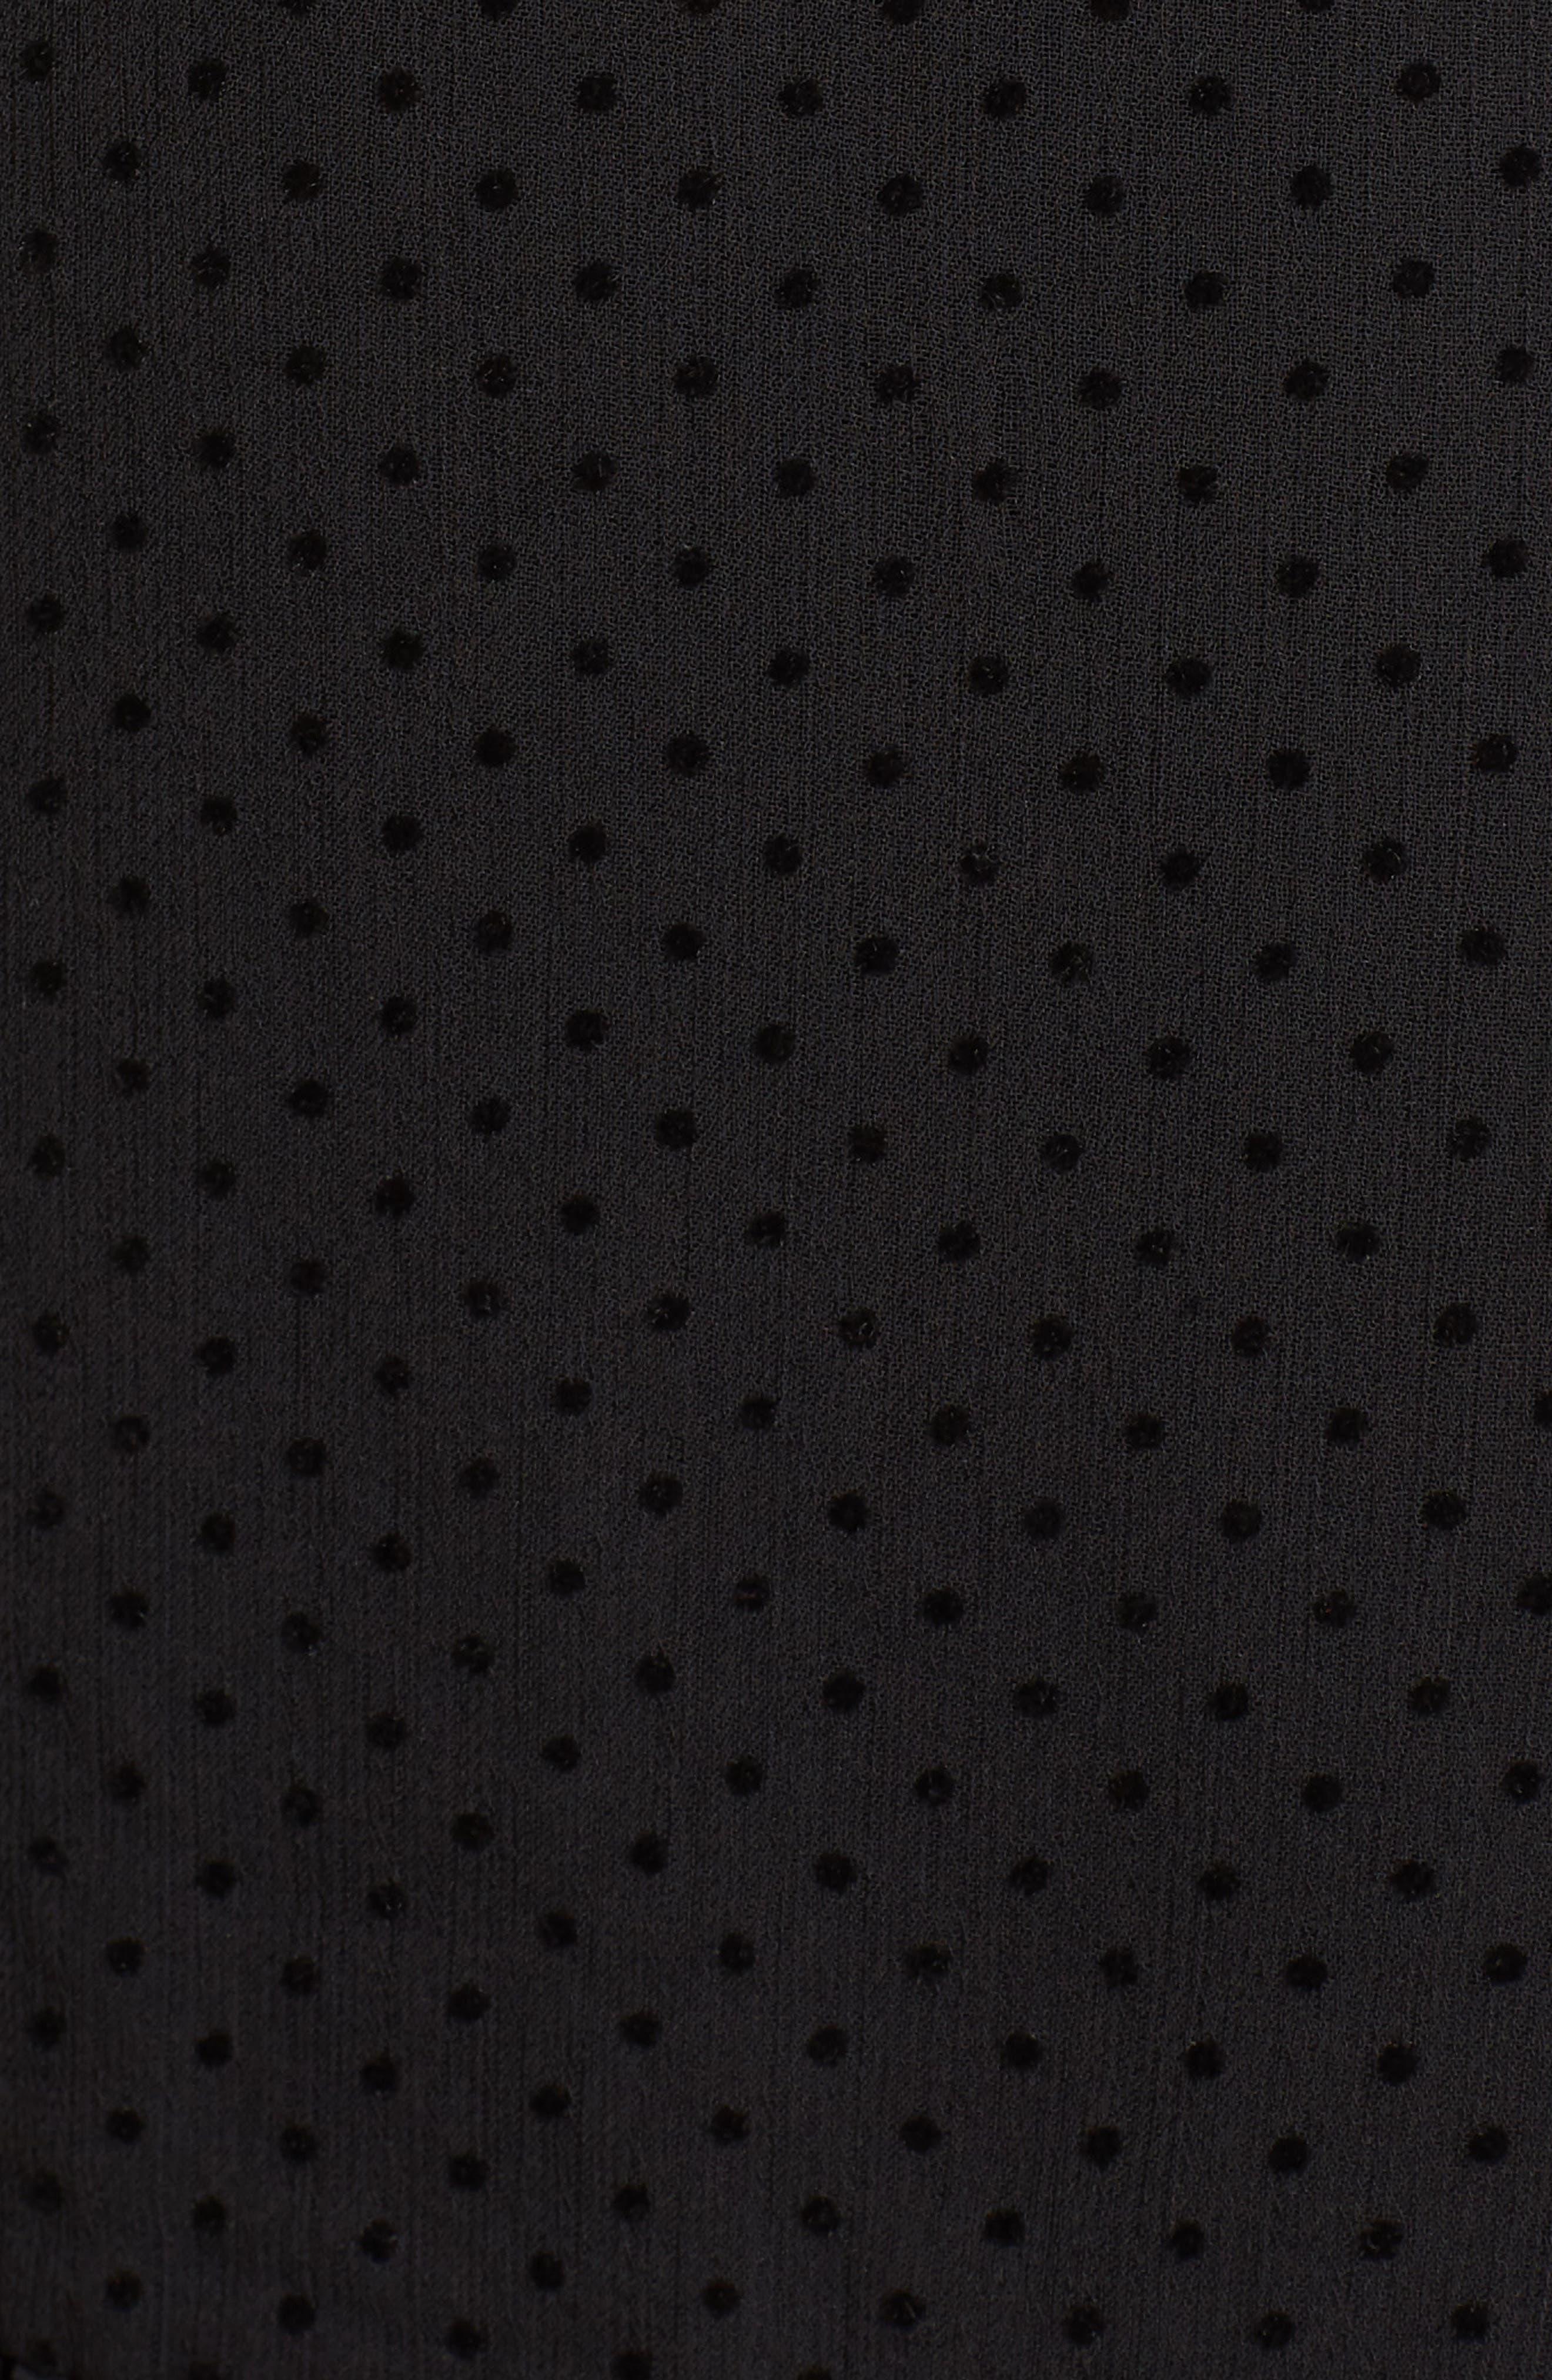 Horizons Bell Sleeve Minidress,                             Alternate thumbnail 6, color,                             Black